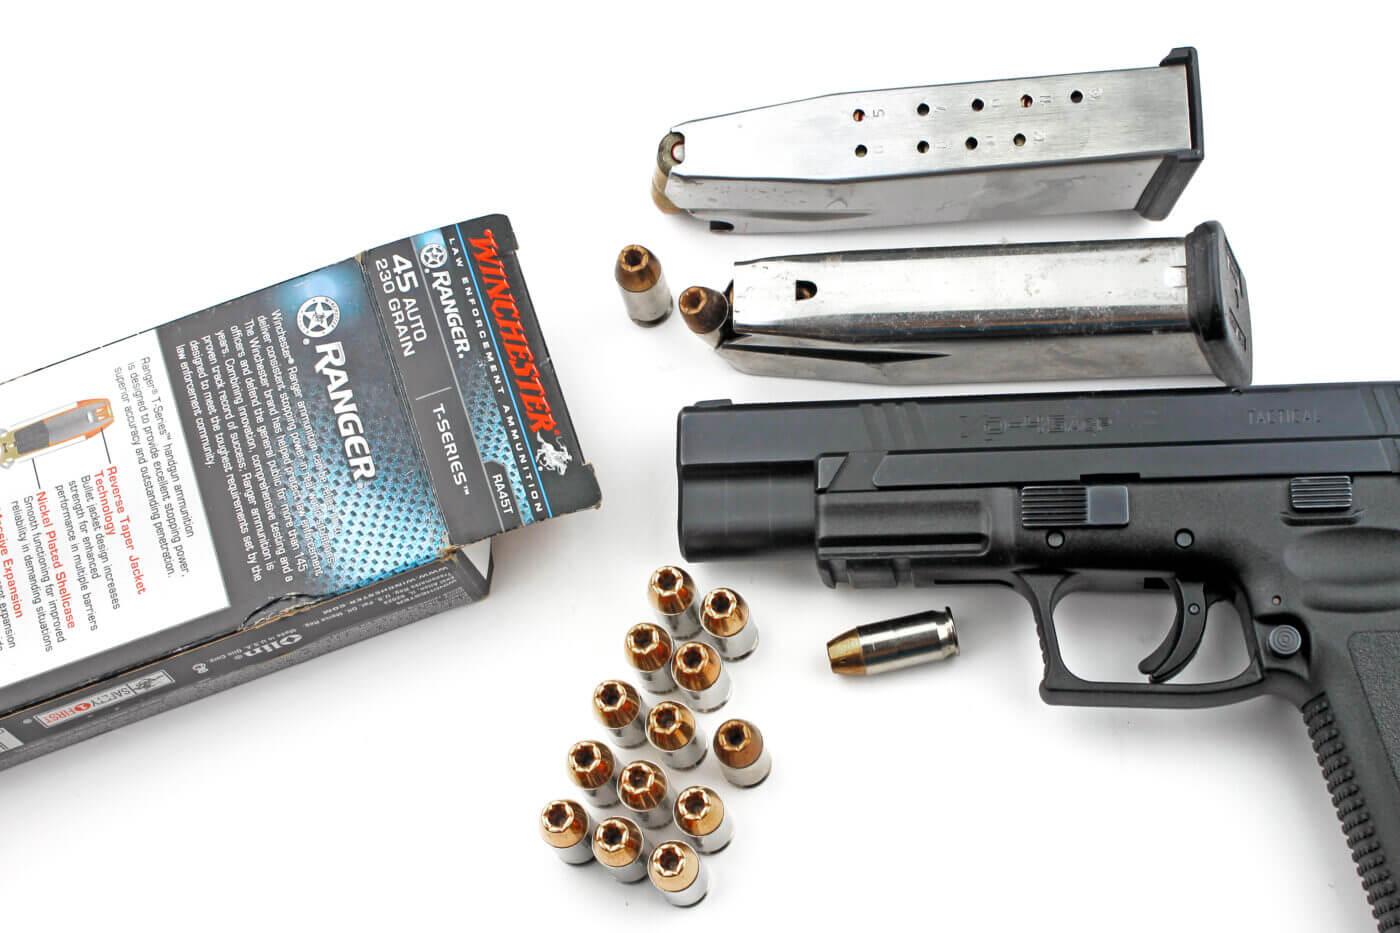 High capacity .45 ACP pistol